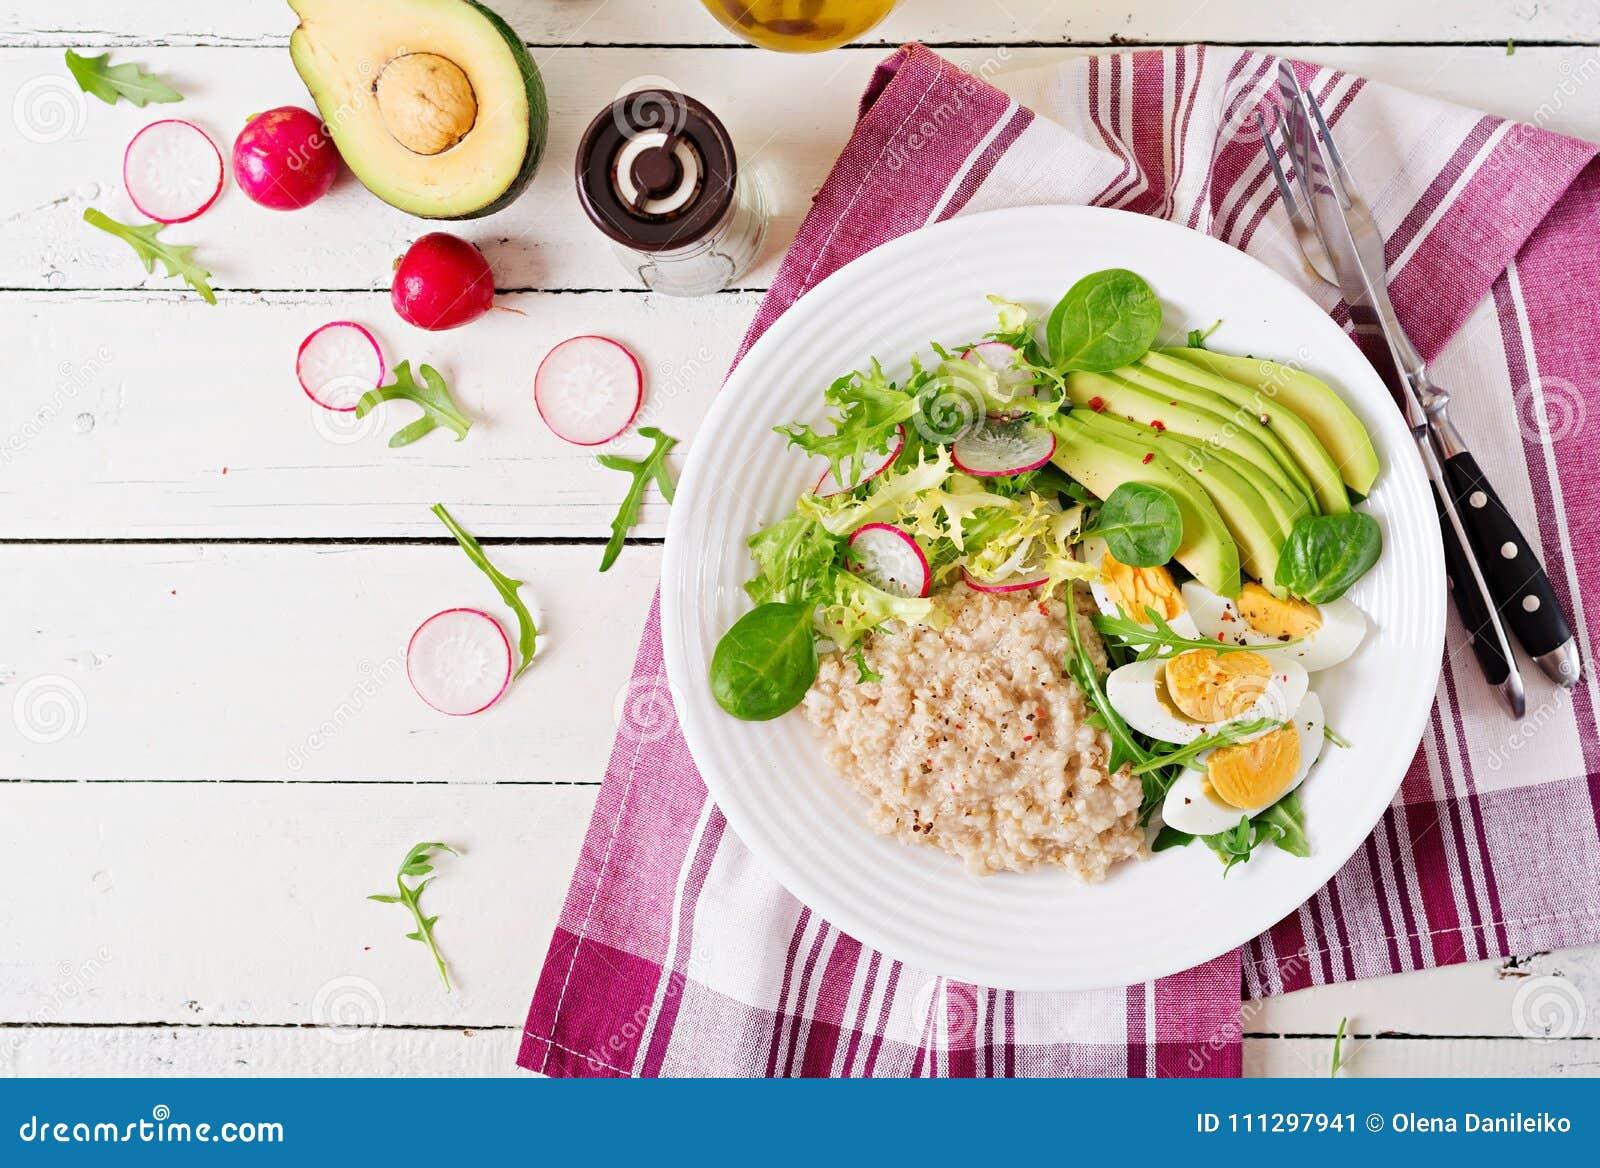 Healthy breakfast. Dietary menu. Oatmeal porridge and avocado salad and eggs.